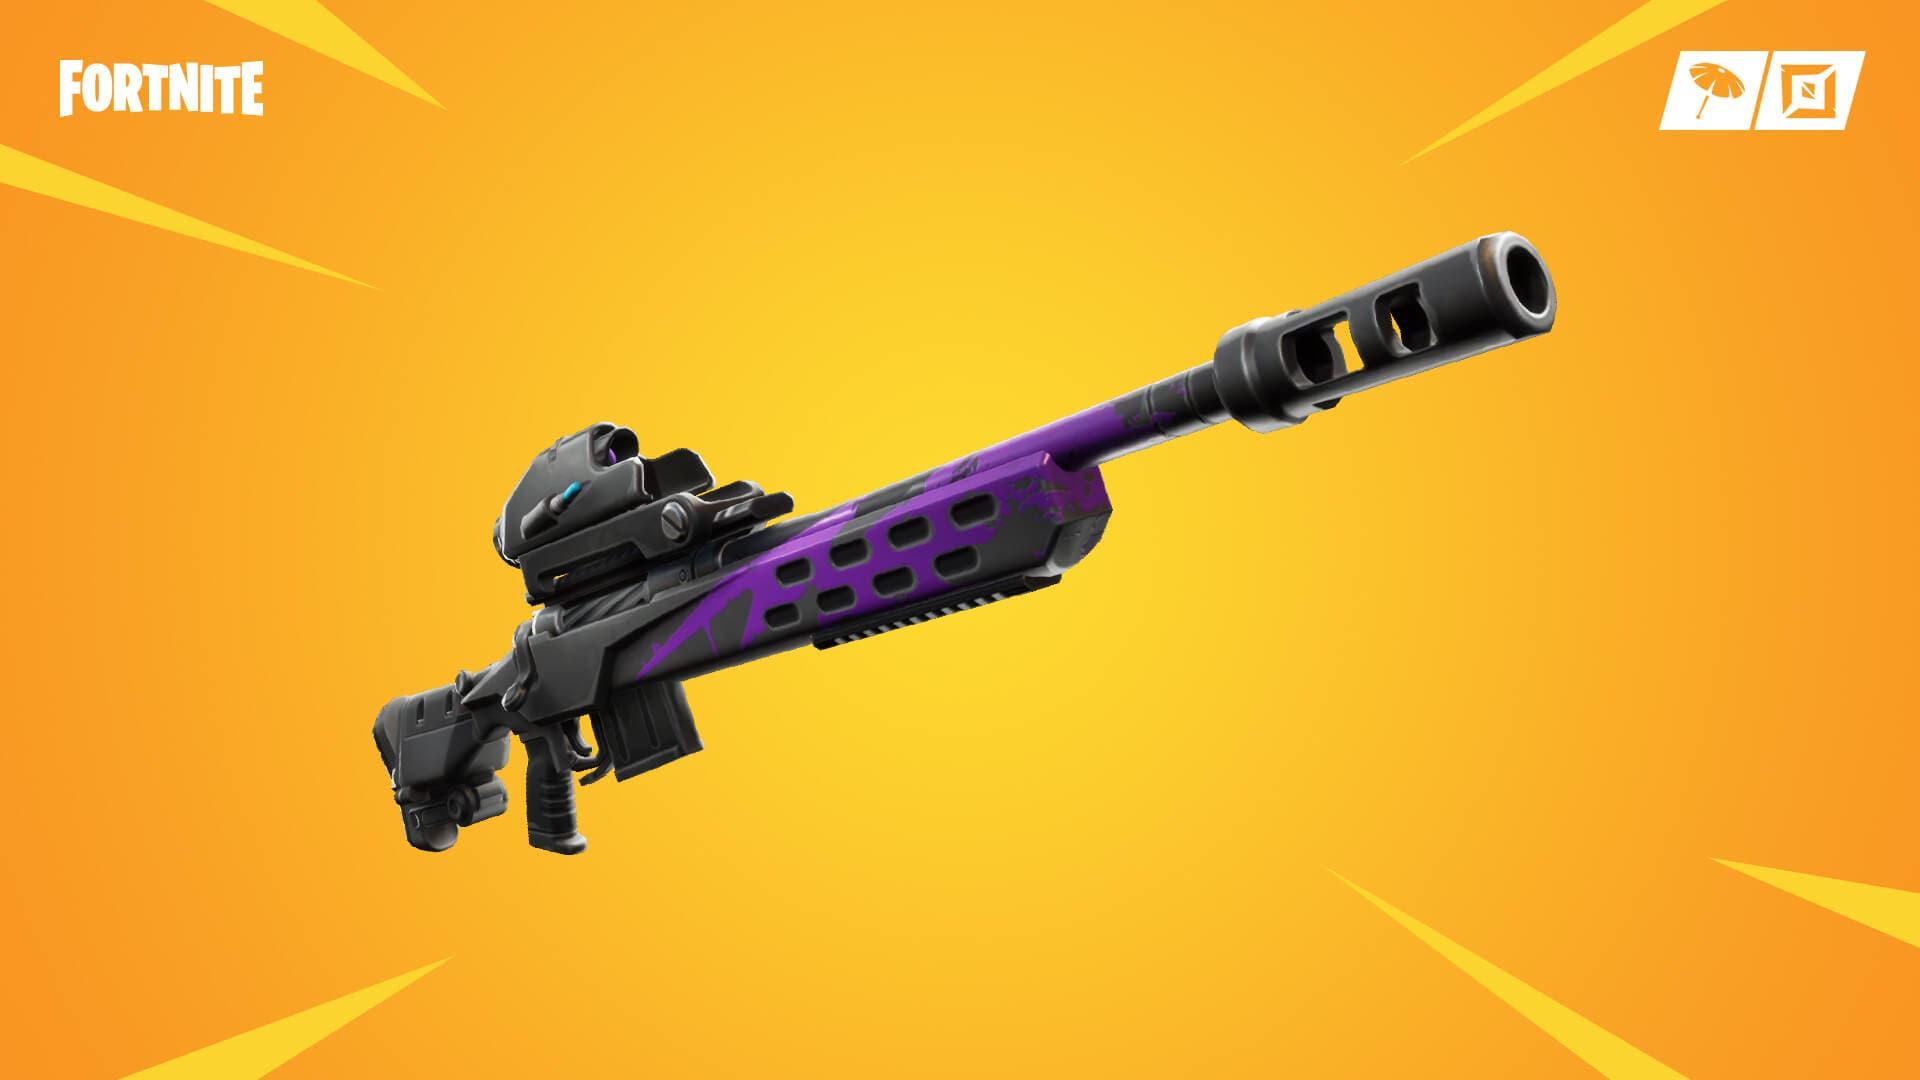 Imagen de El fusil de tirador exploratormentas llega a Fortnite en la actualización 9.41